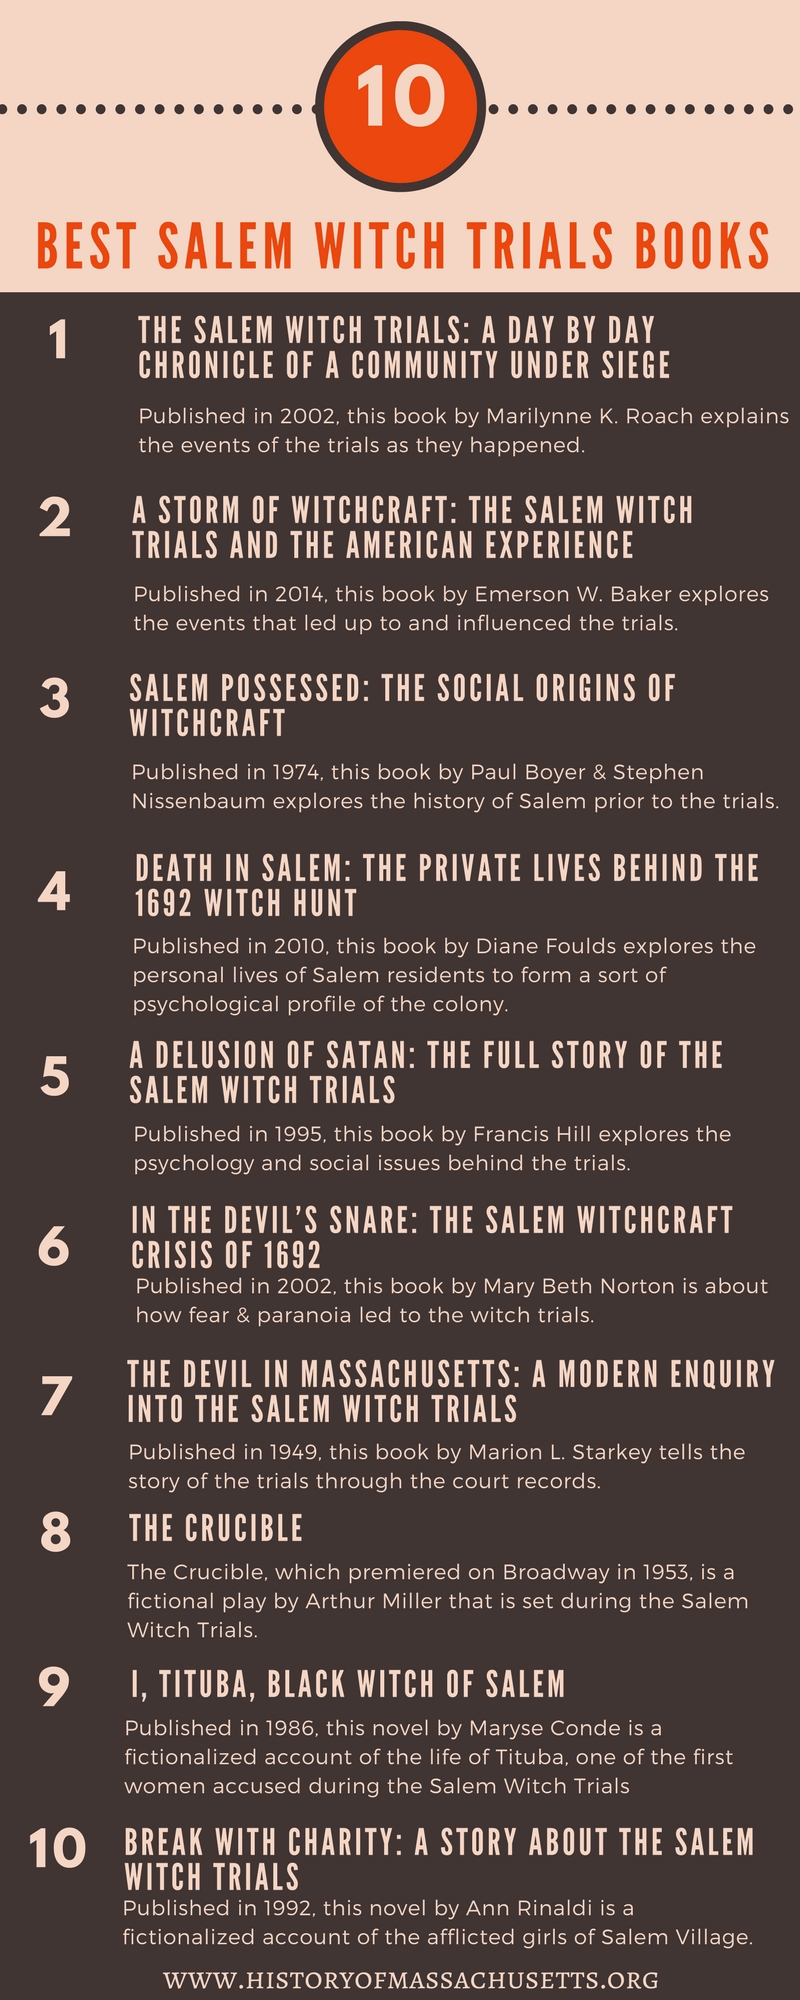 Best-Salem-Witch-Trials-Books-Infographic